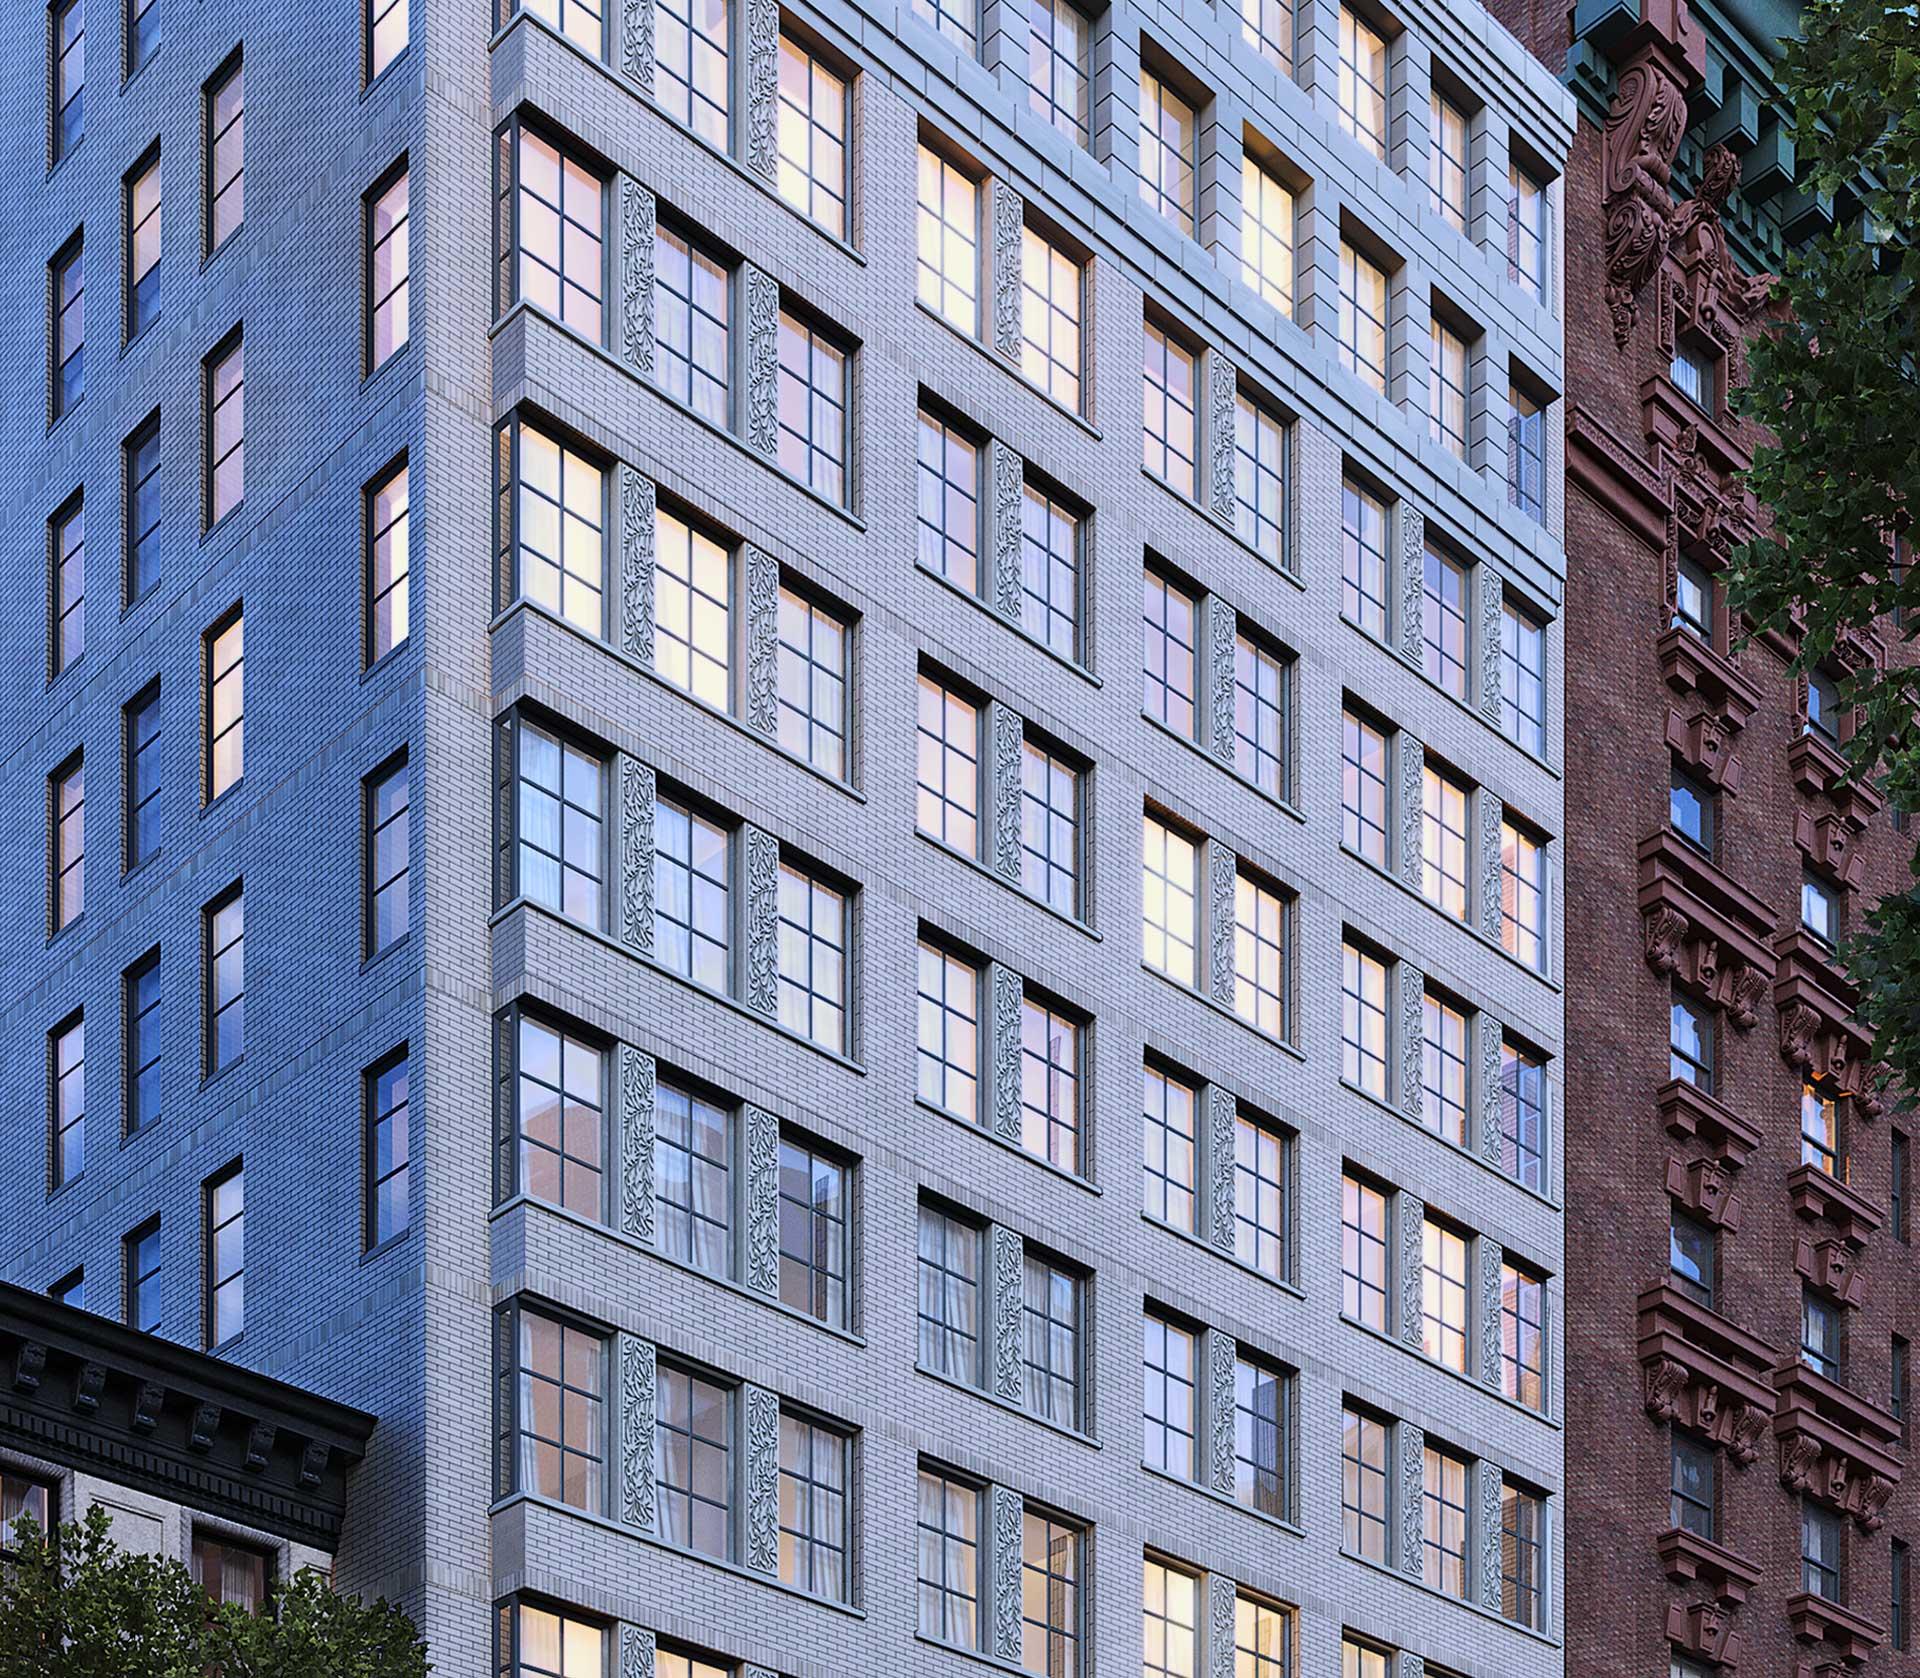 207 West 79th Street